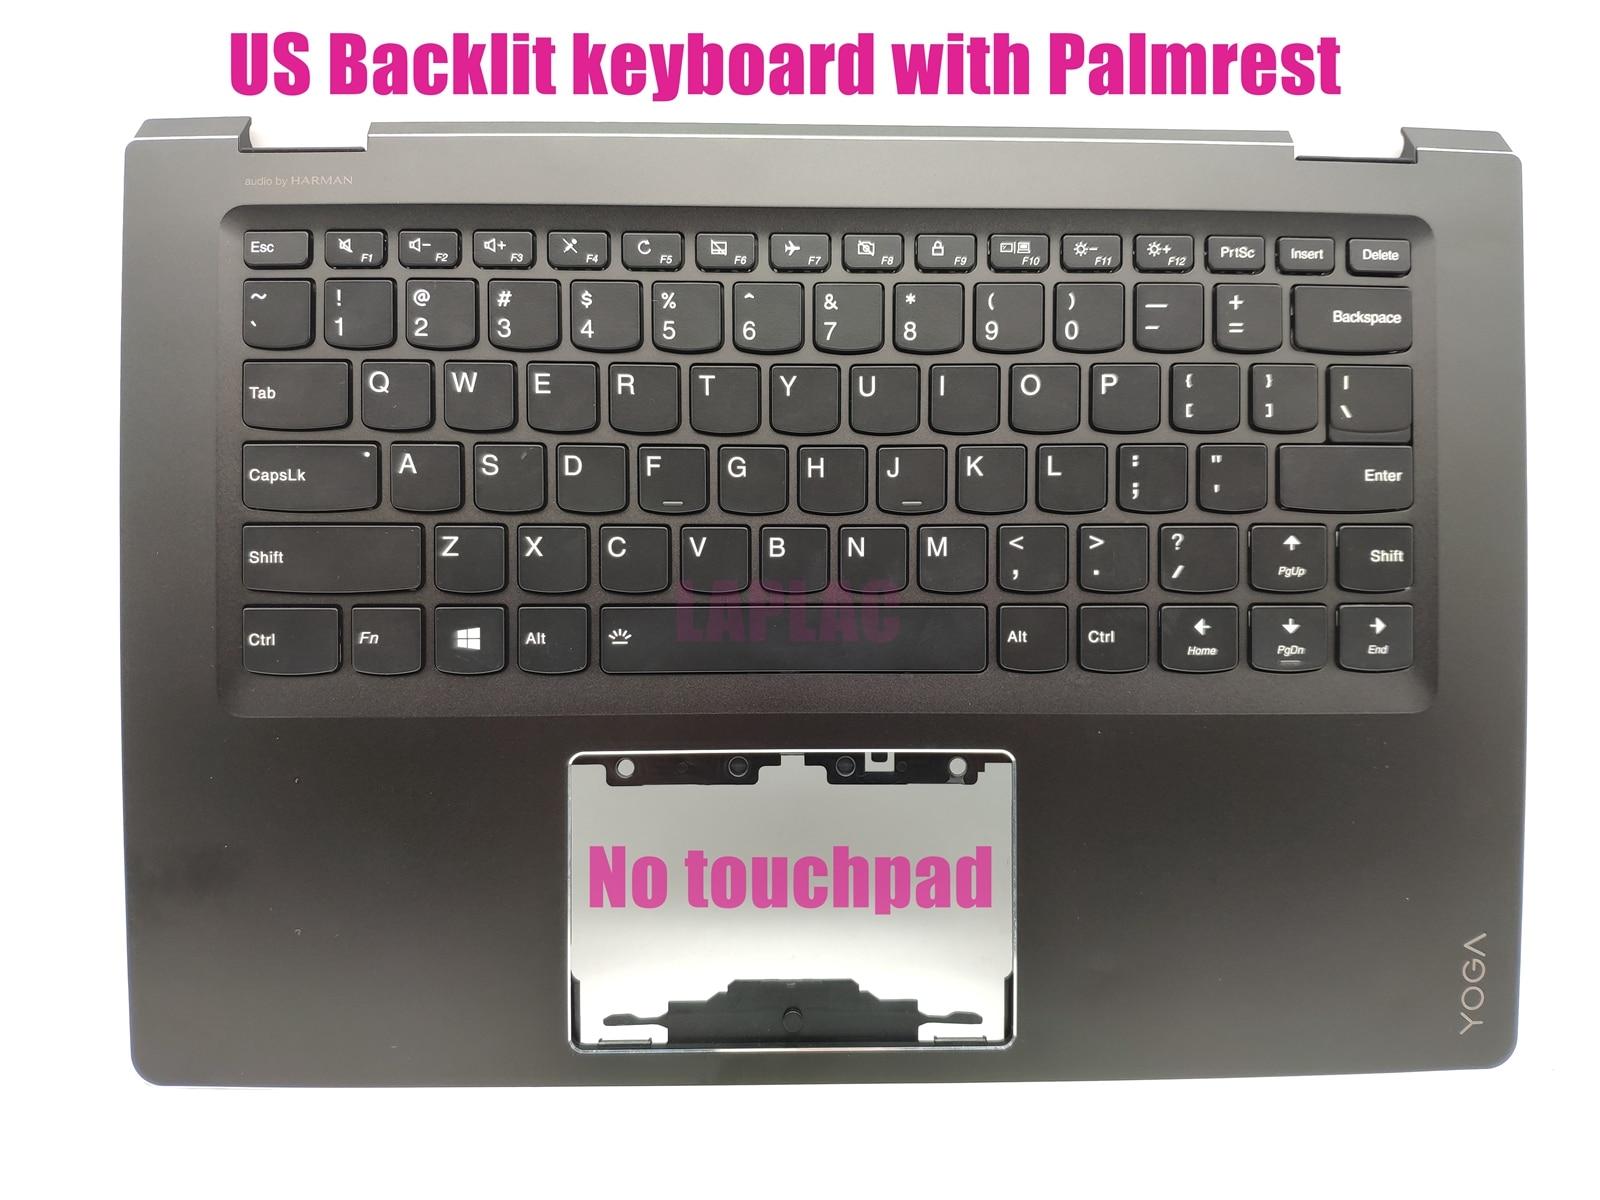 Teclado retroiluminado US Palmrest para Lenovo Yoga 510-14AST (80S9)/510-14IKB (80VB)/510-14ISK (80S7/80UK) AM1JE000120 5CB0L66081 WKG27